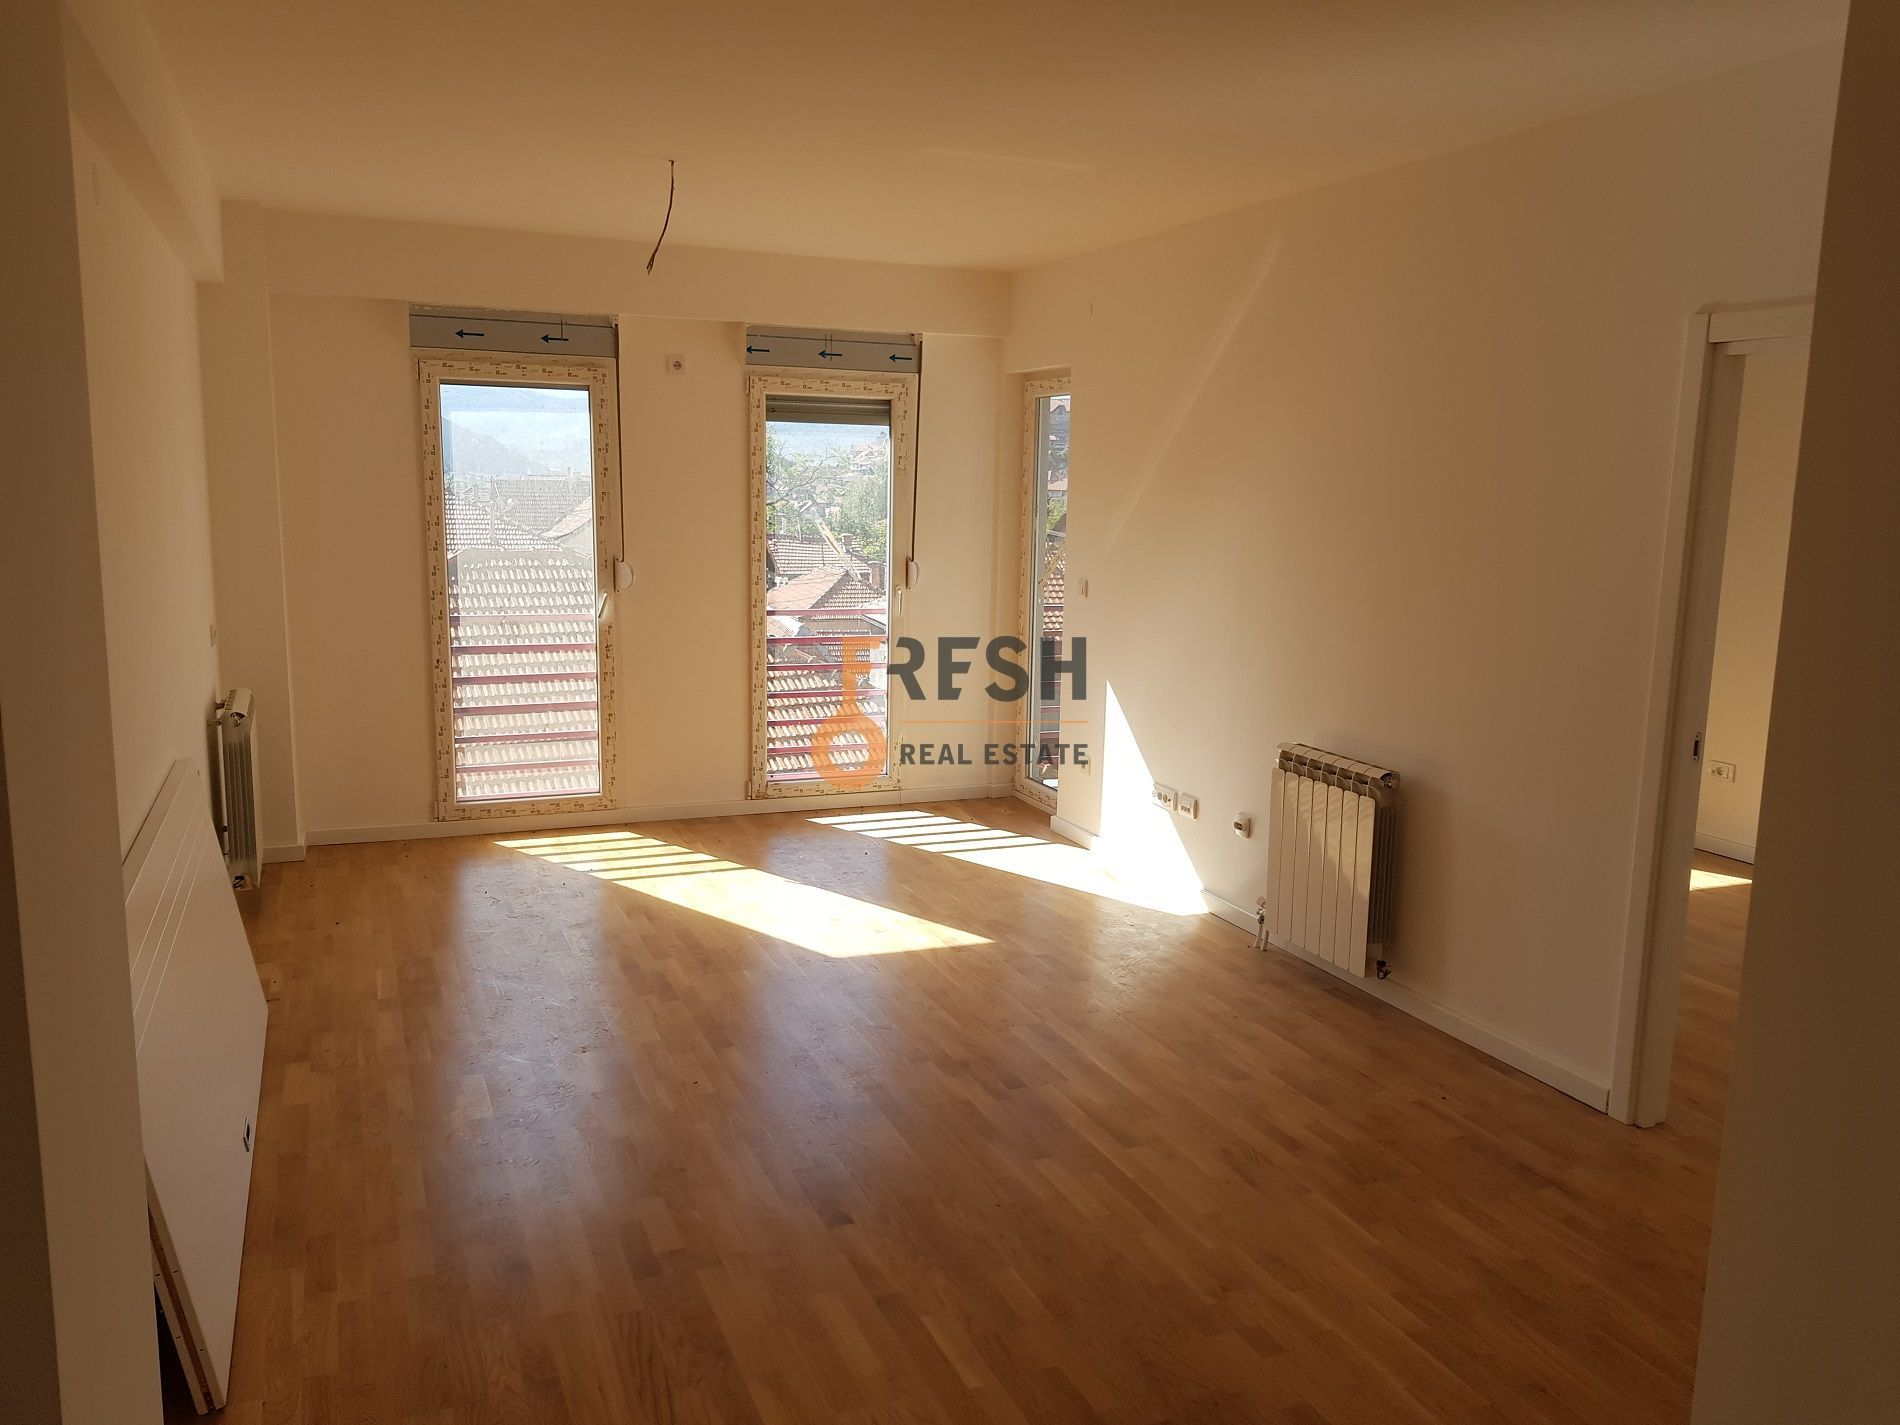 Jednosoban stan 45 m2, Centar, Pljevlja, Prodaja - 6